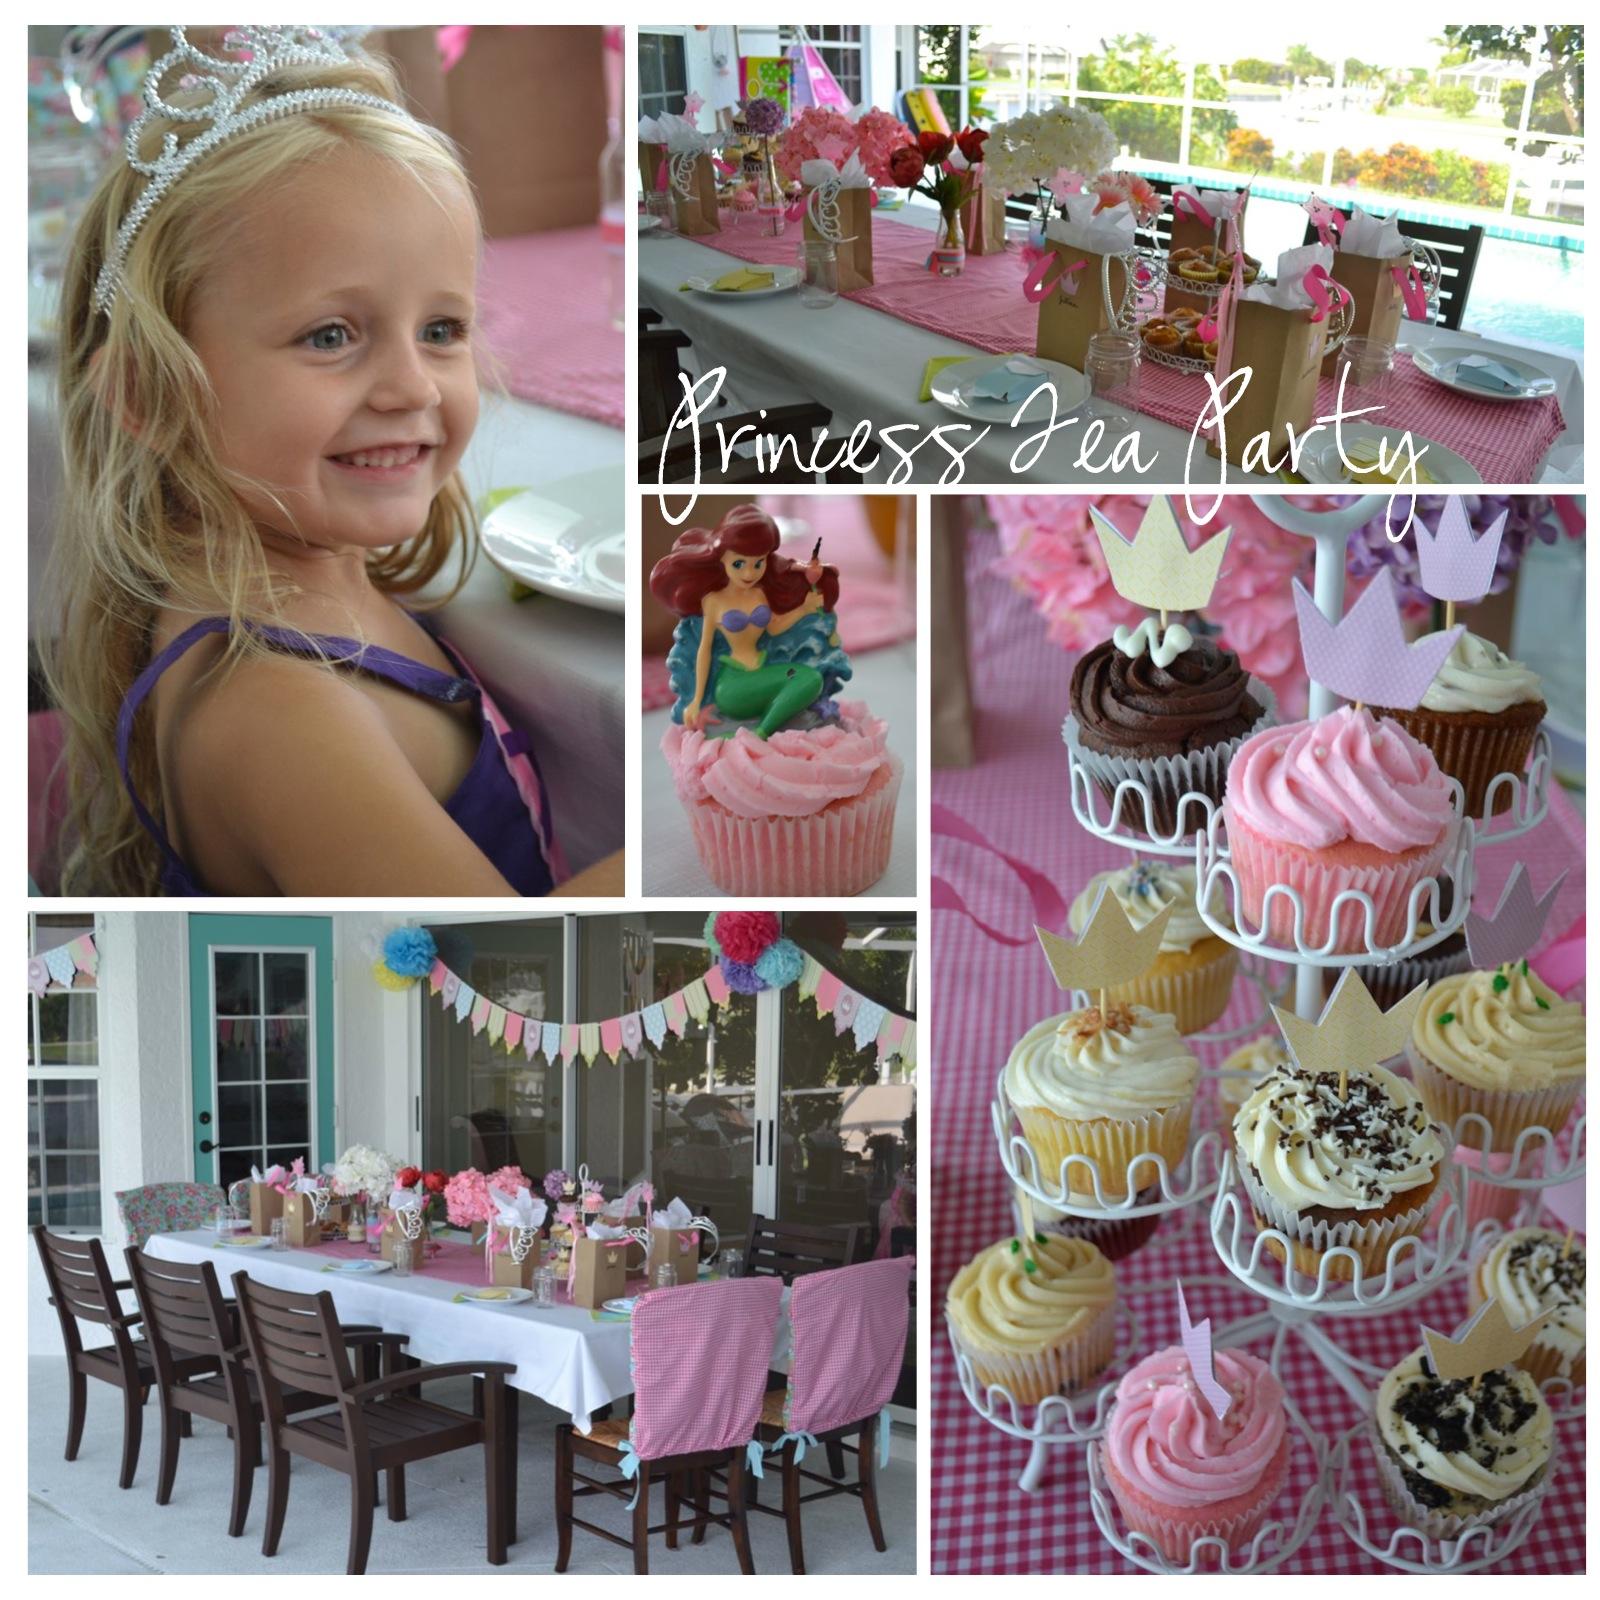 Kids Birthday Ideas Princess Tea Party Living Well Spending Less